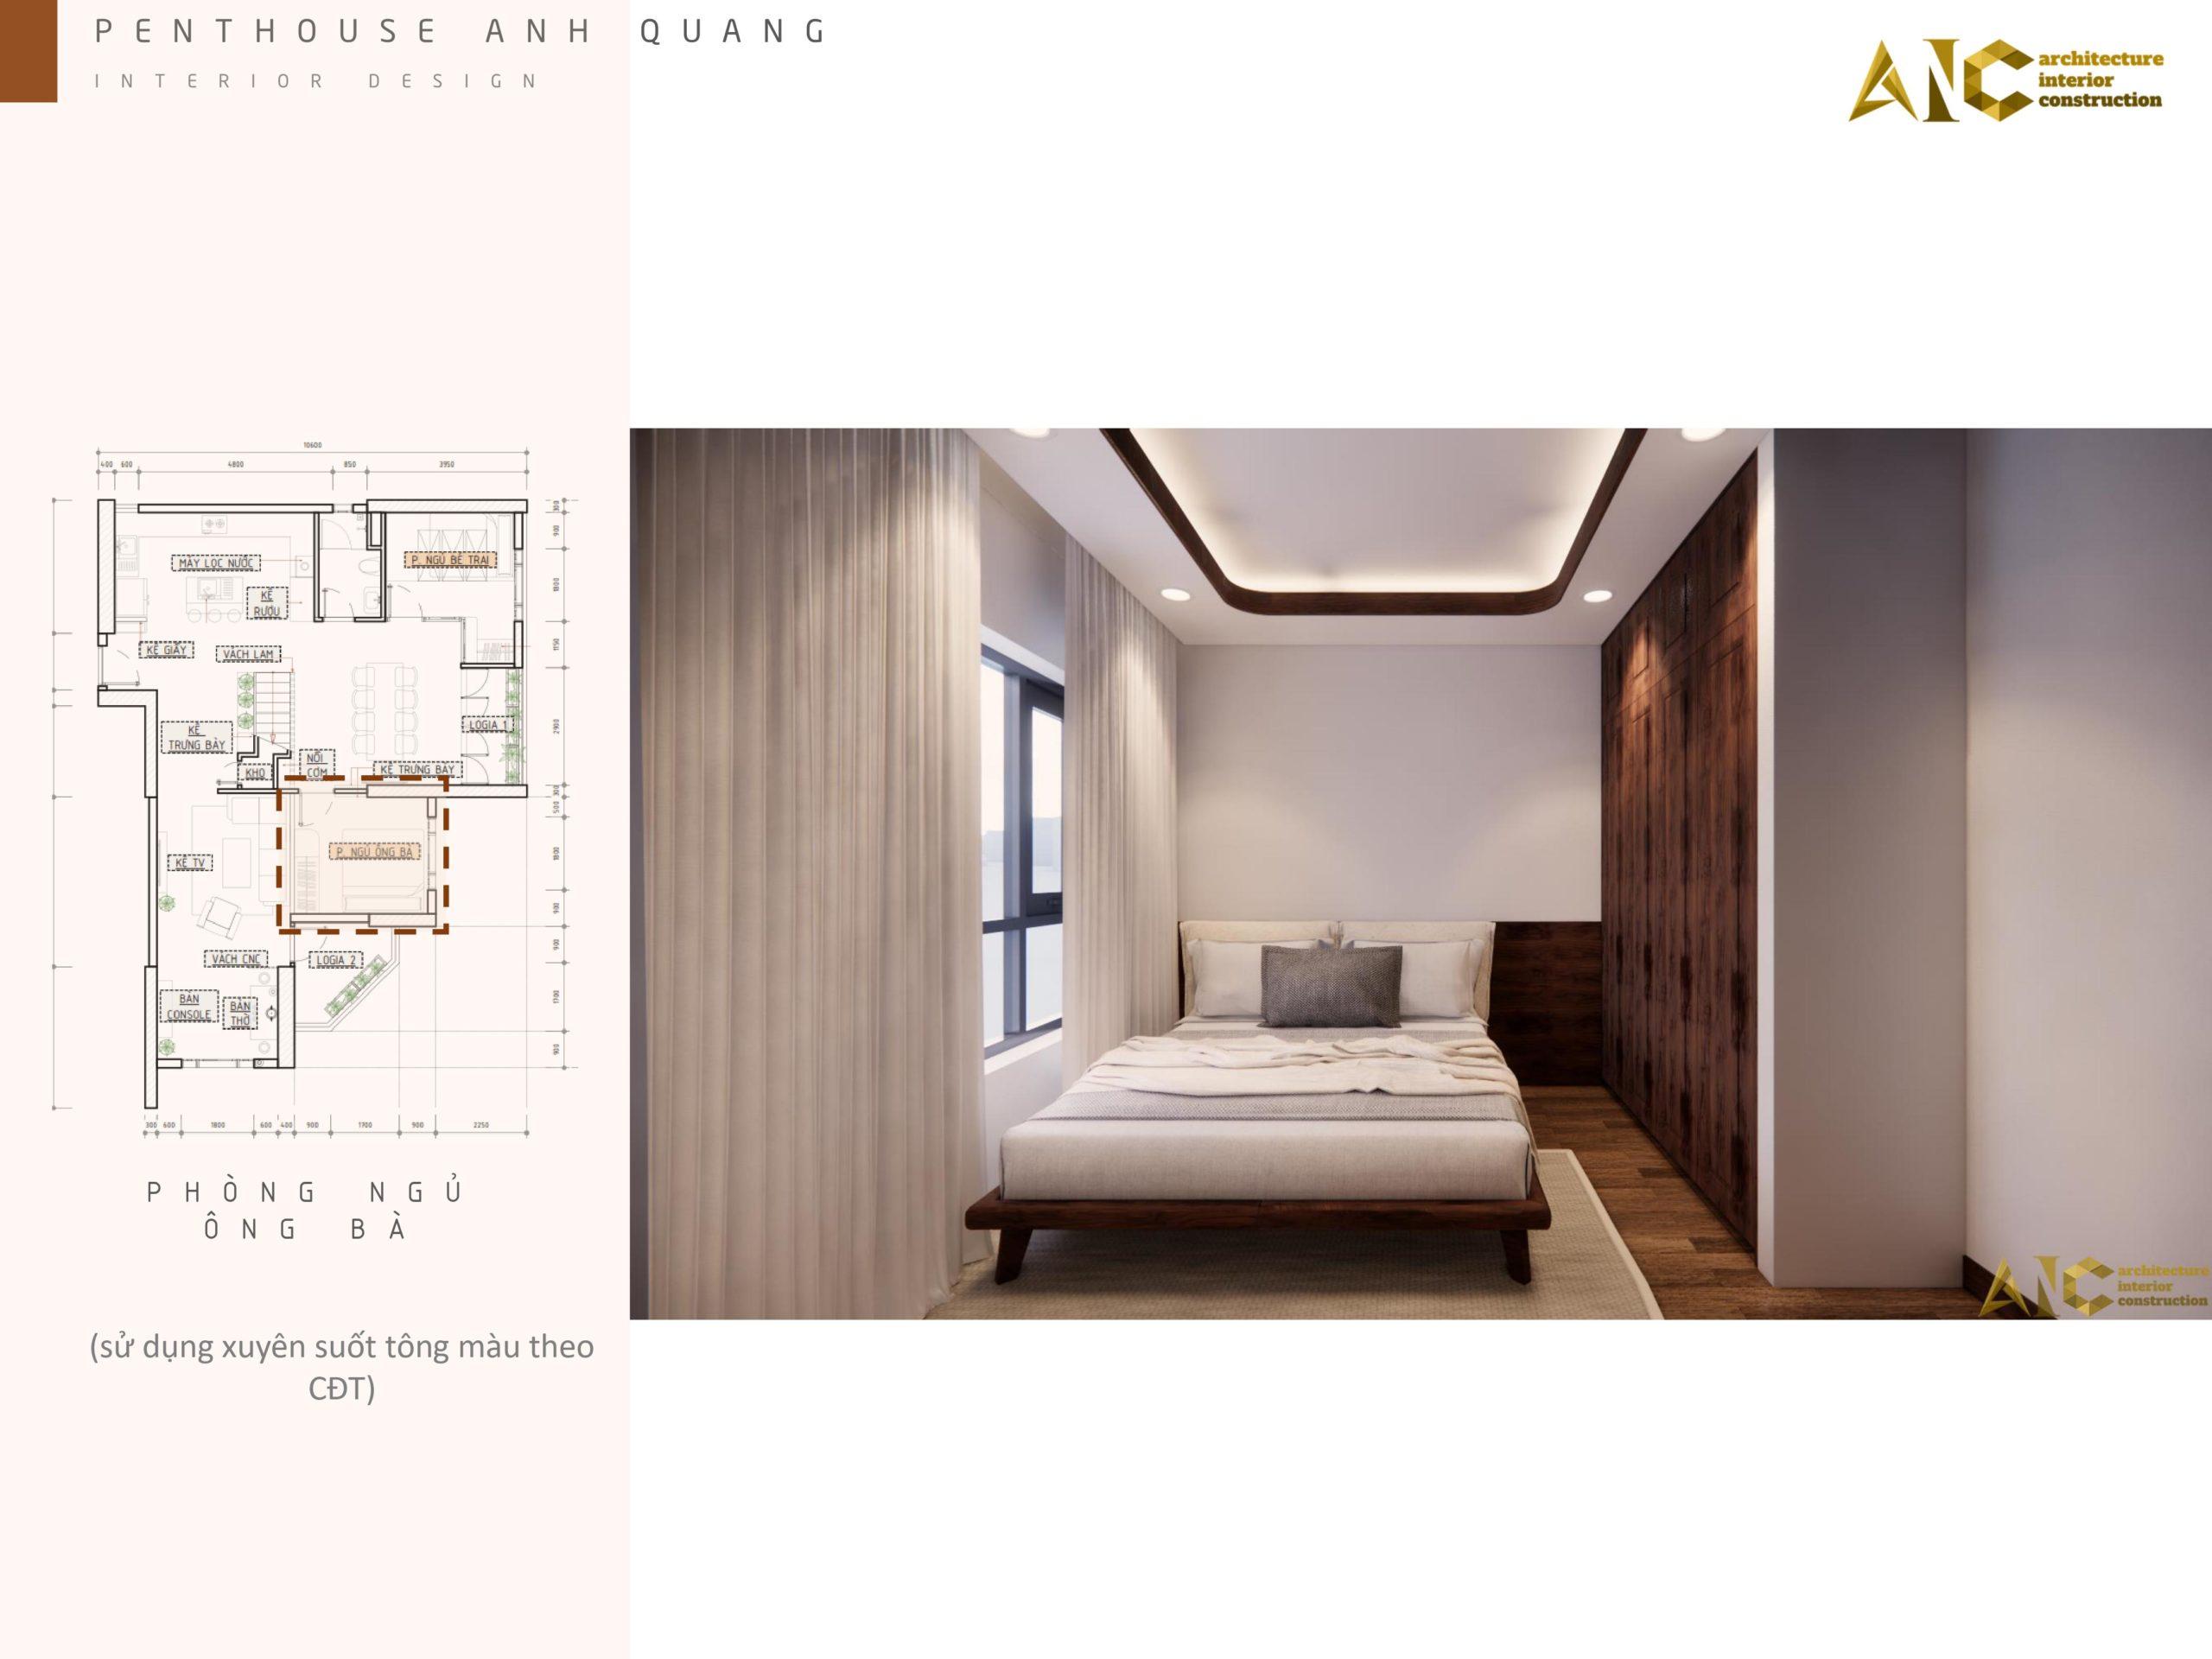 Penthouse-Anh-Quang-AIC-JSC-0063